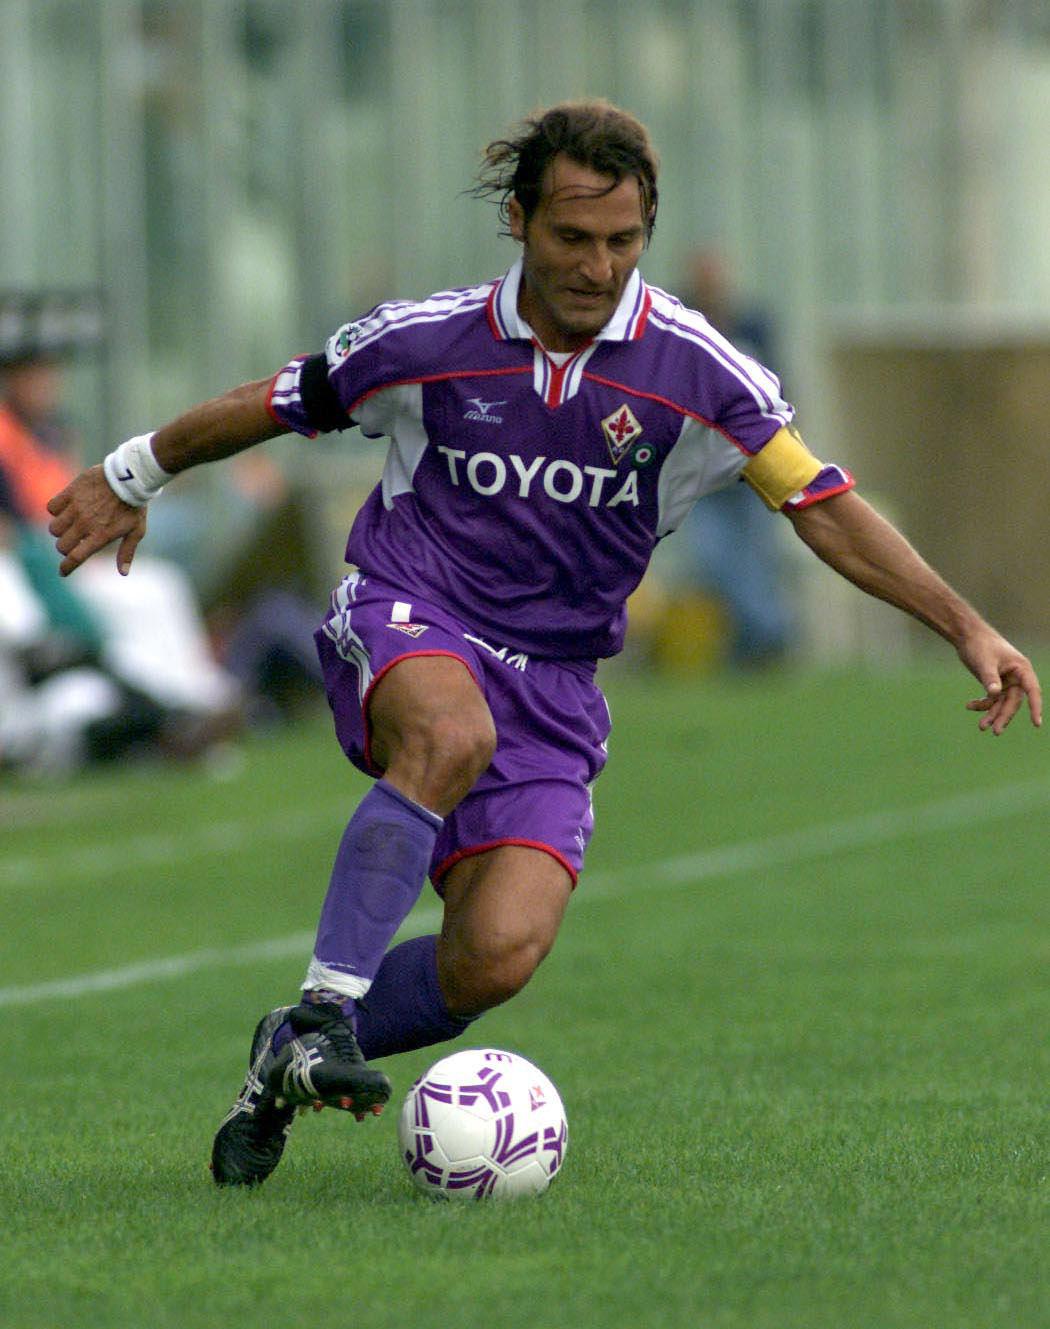 Fiorentina-Juve, la storia dei doppi ex